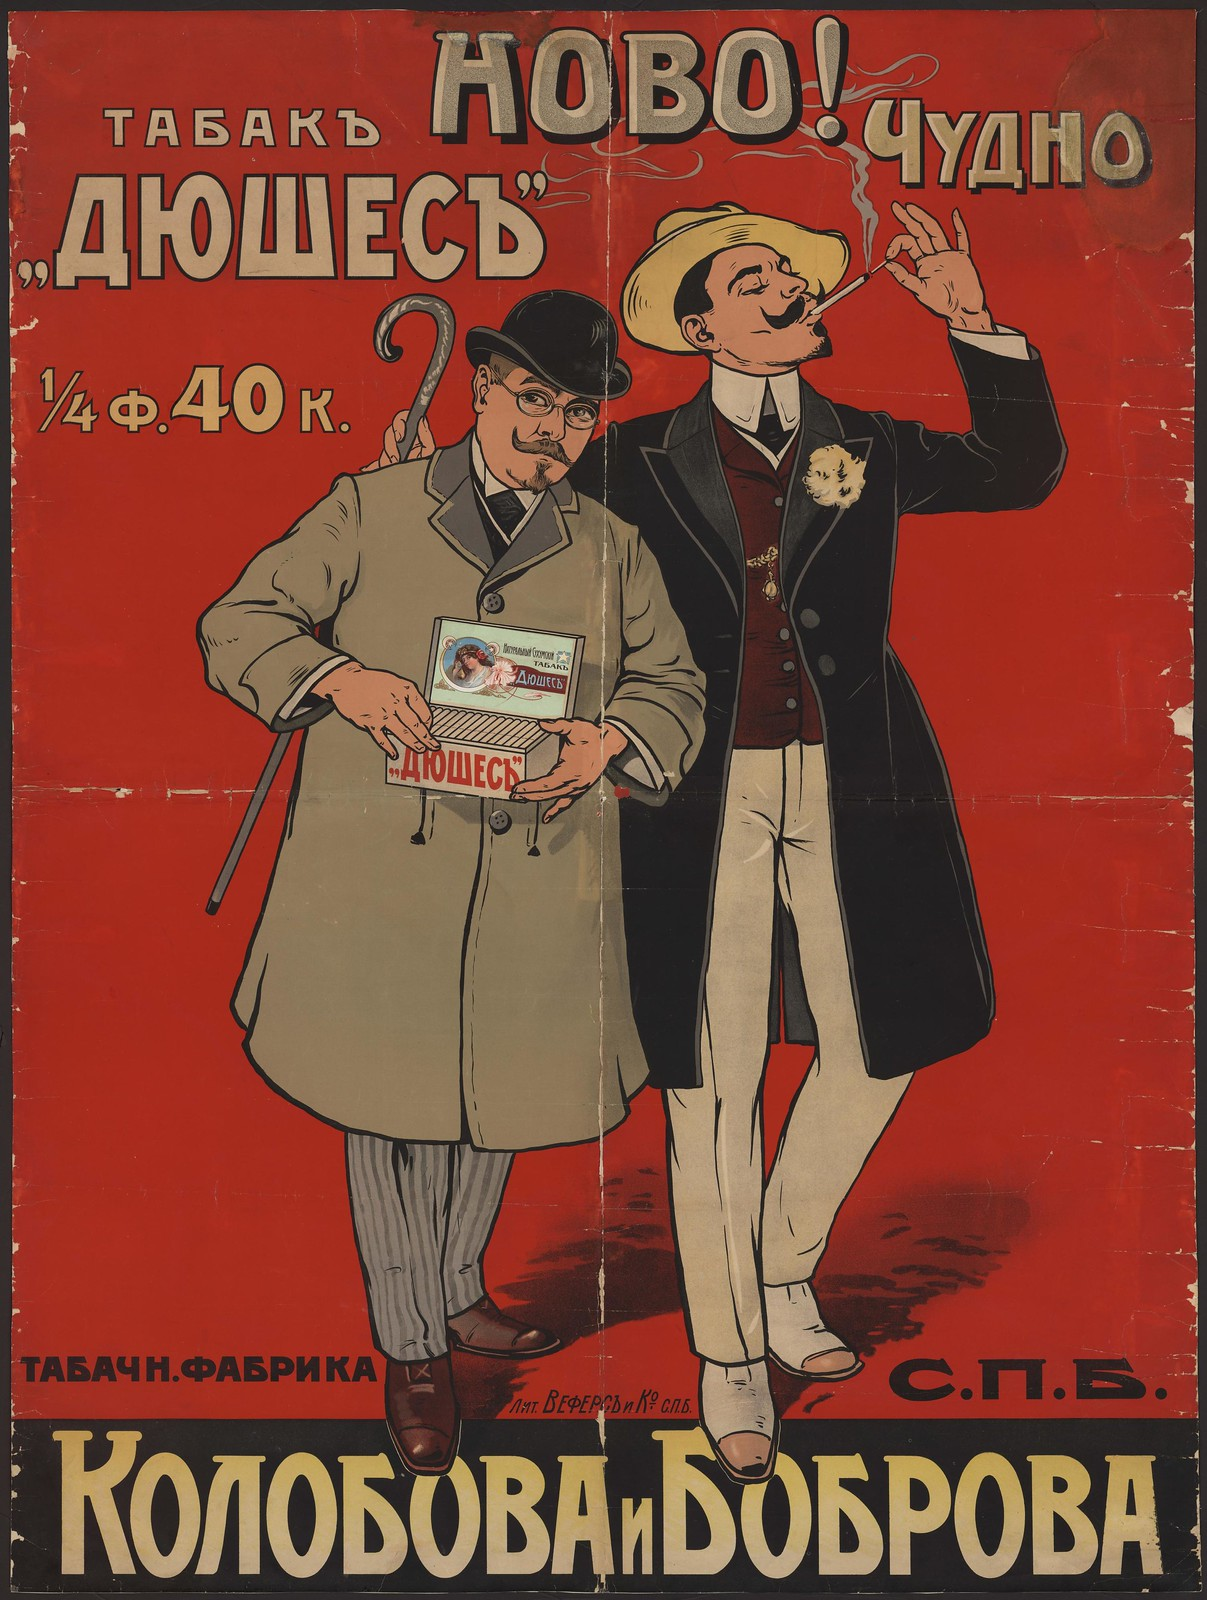 Ново! Чудно! Табак «Дюшес». Табачная фабрика Колобова и Боброва. С.-Петербург